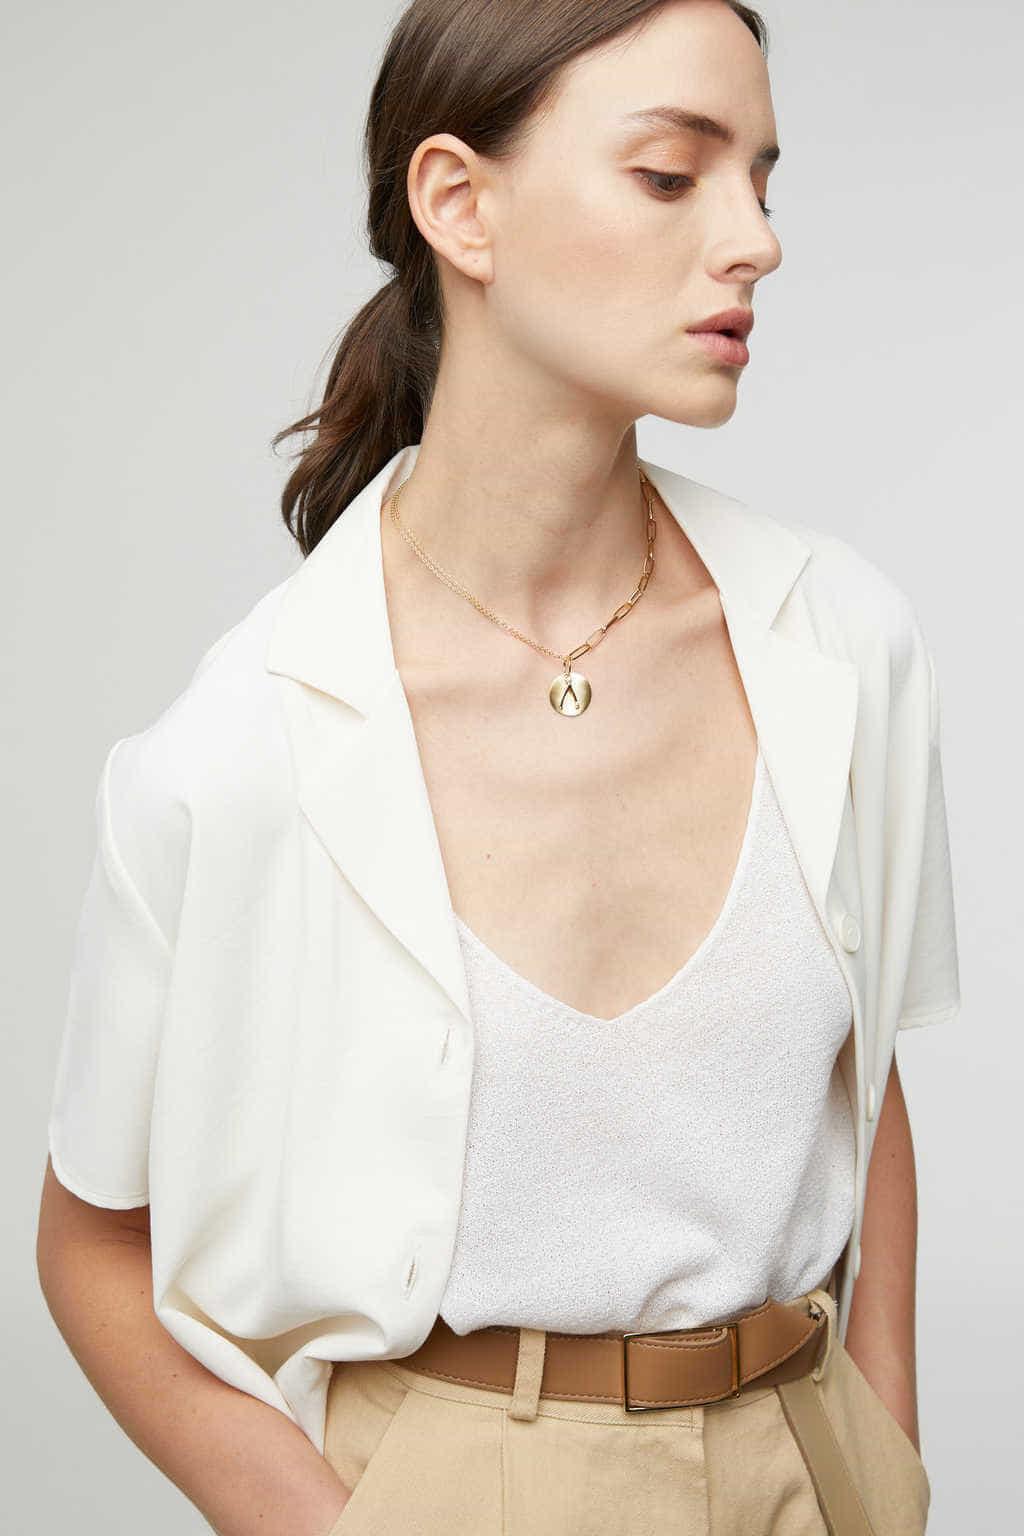 Necklace K009 Gold 1